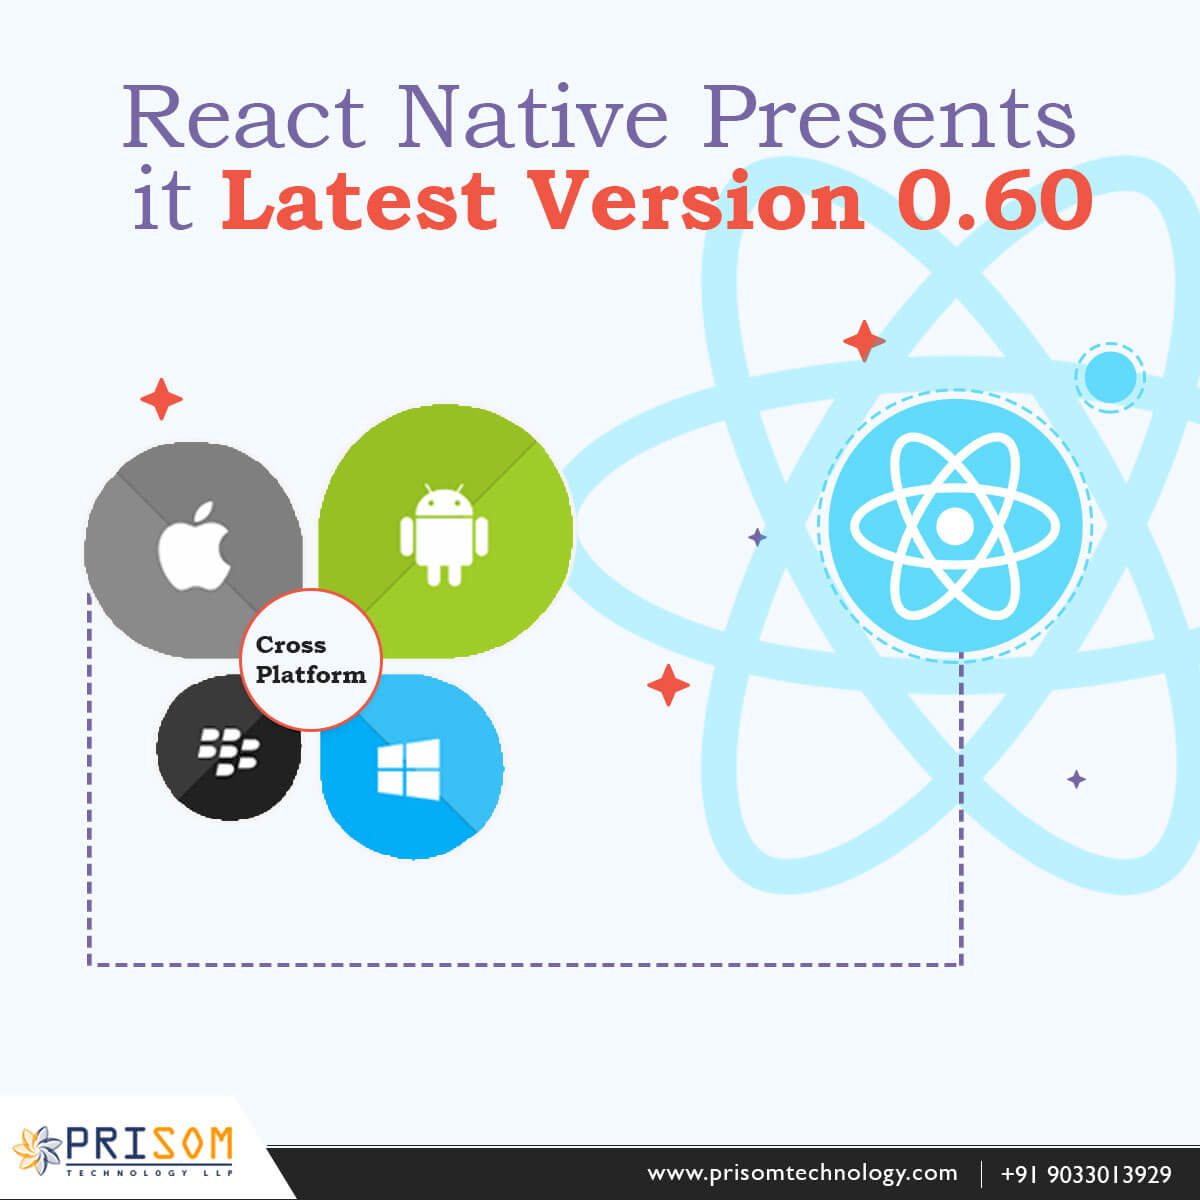 React Native Presents it Latest Version 0.60